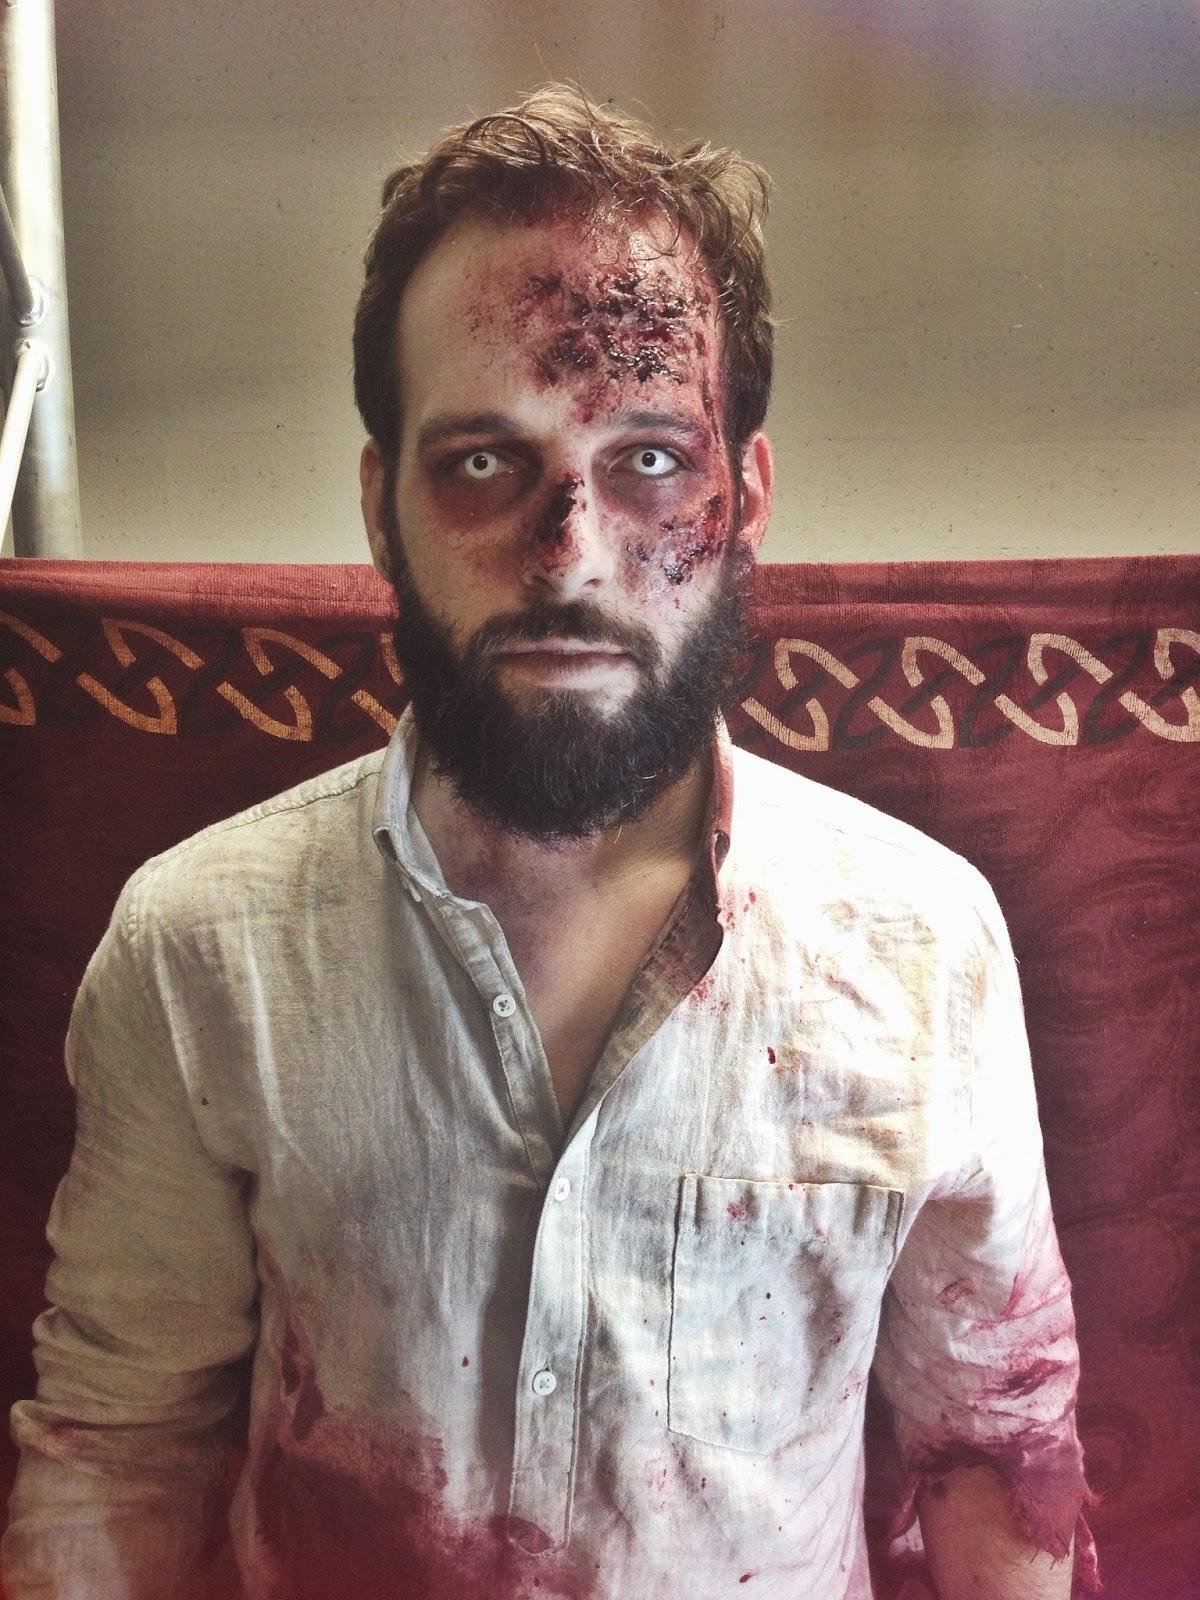 maquillage zombie avec barbe. Black Bedroom Furniture Sets. Home Design Ideas